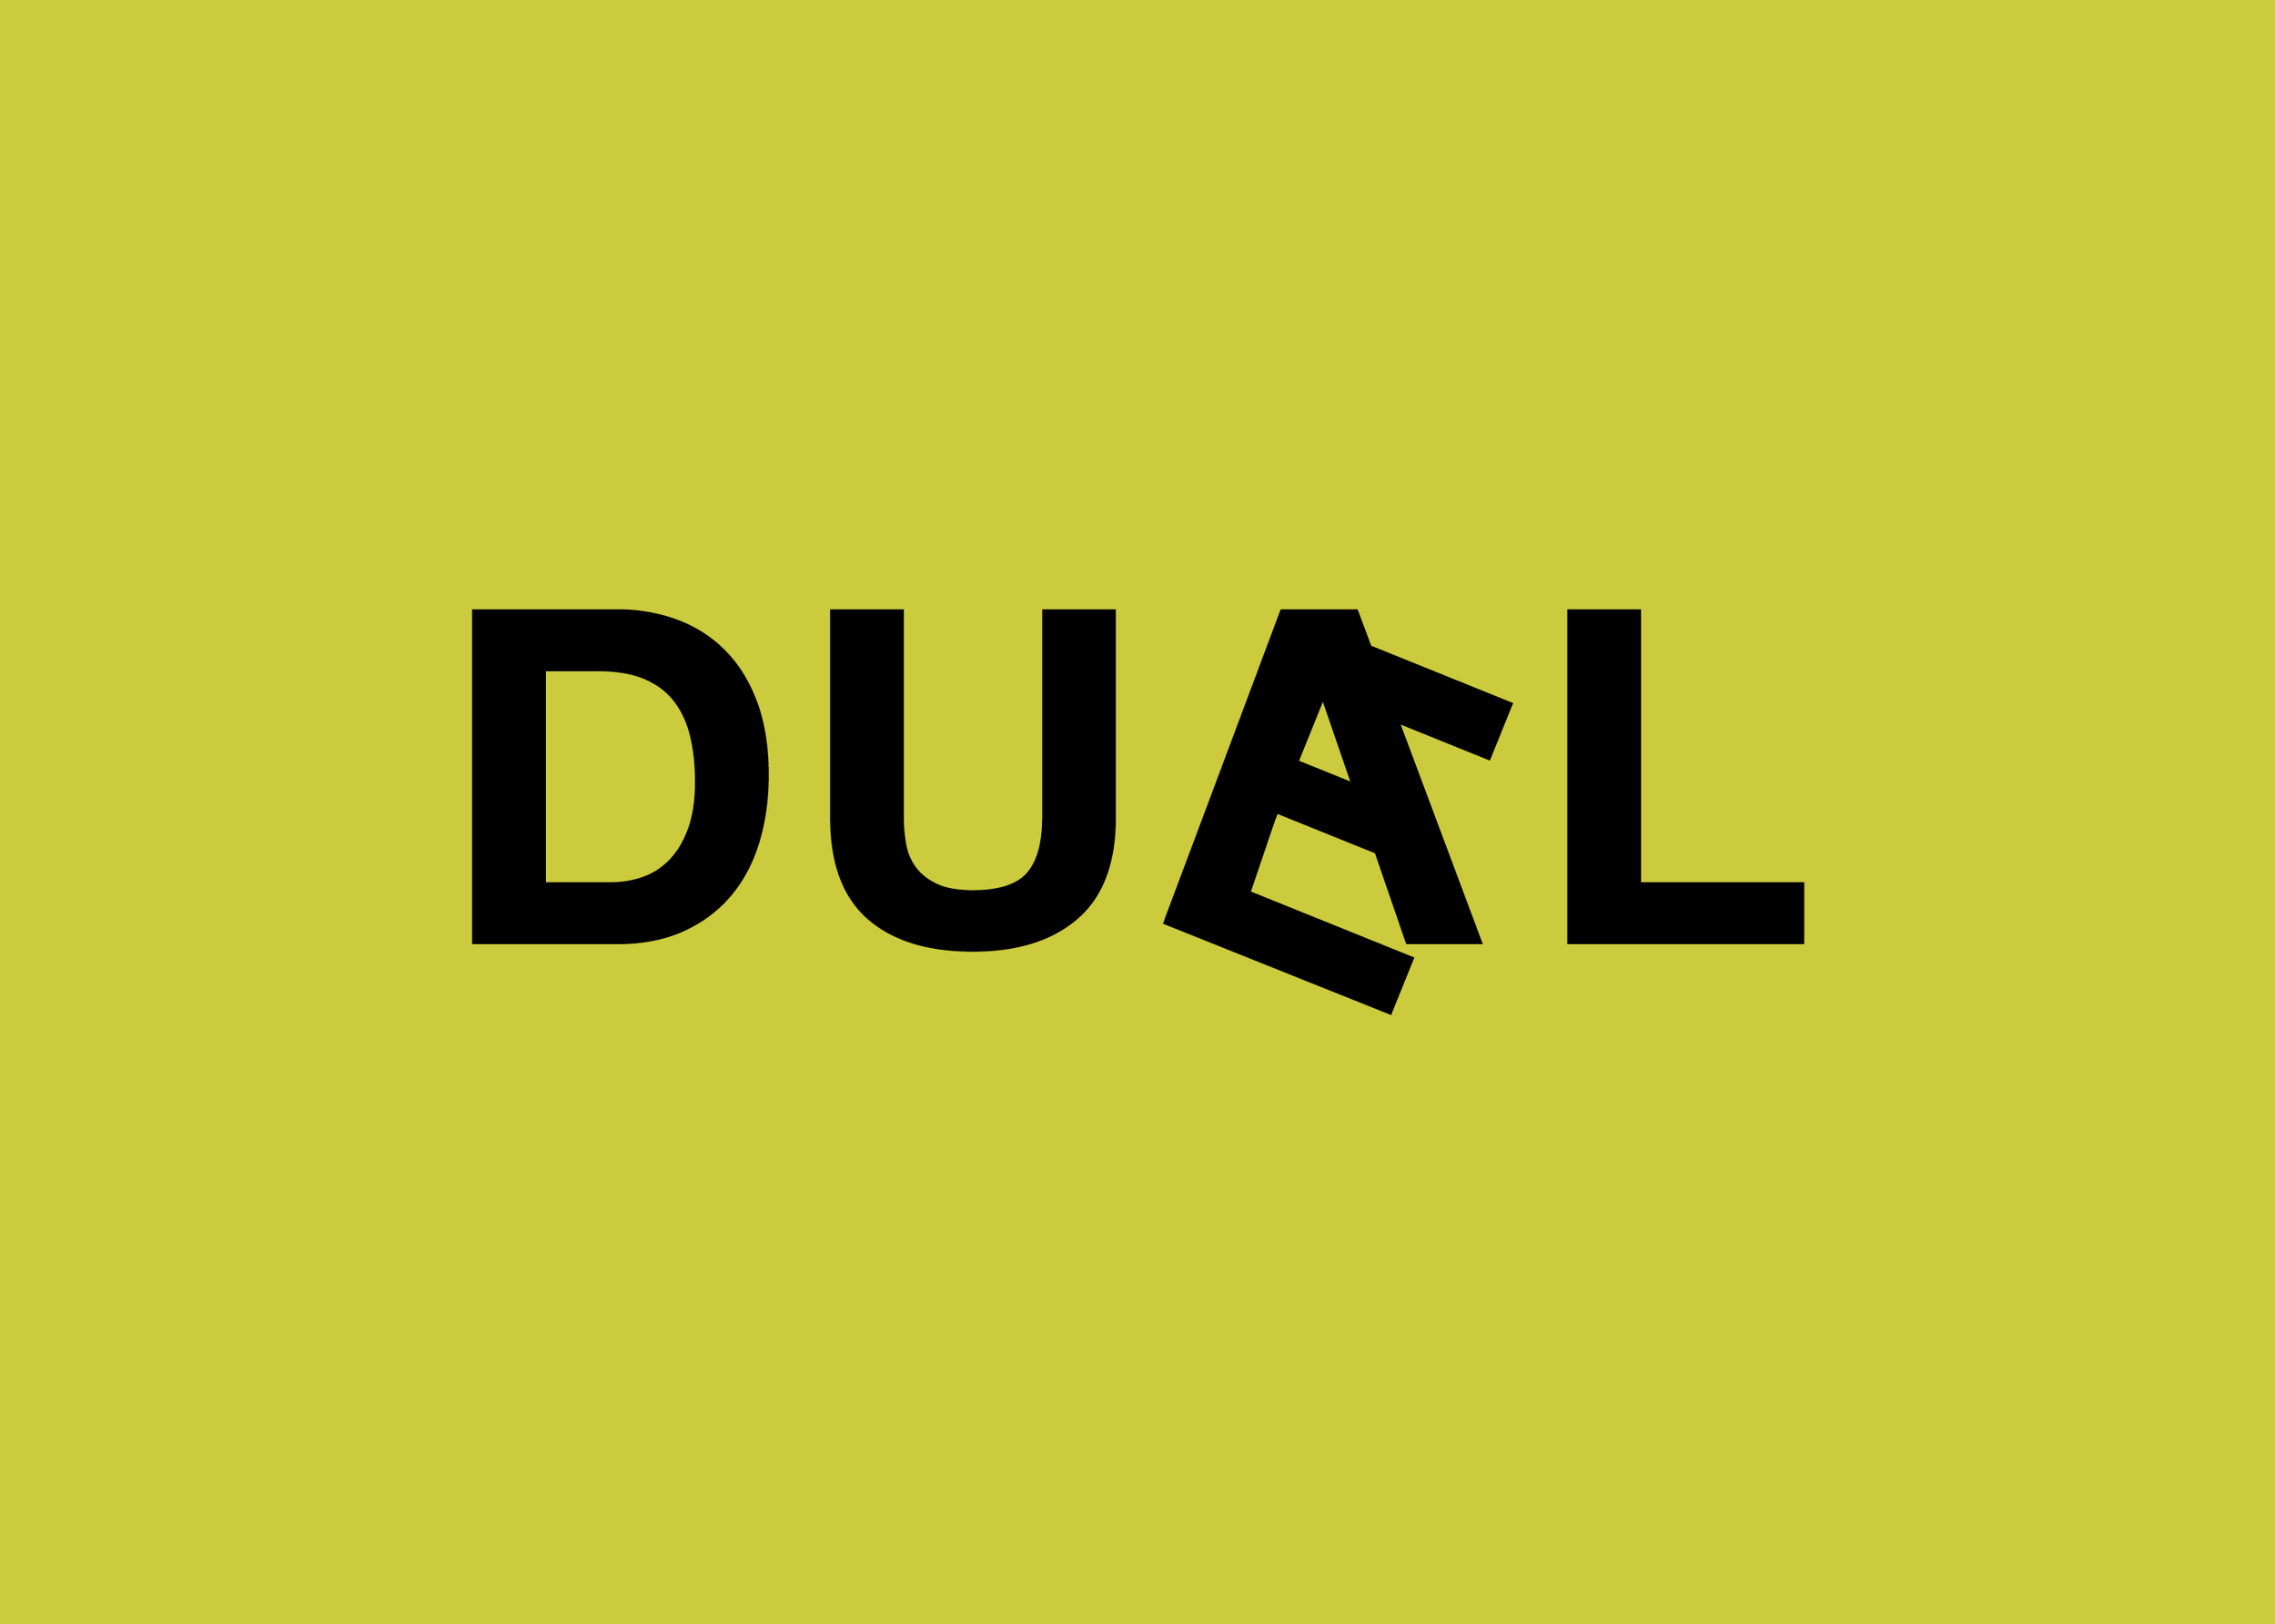 duael_flip20.png